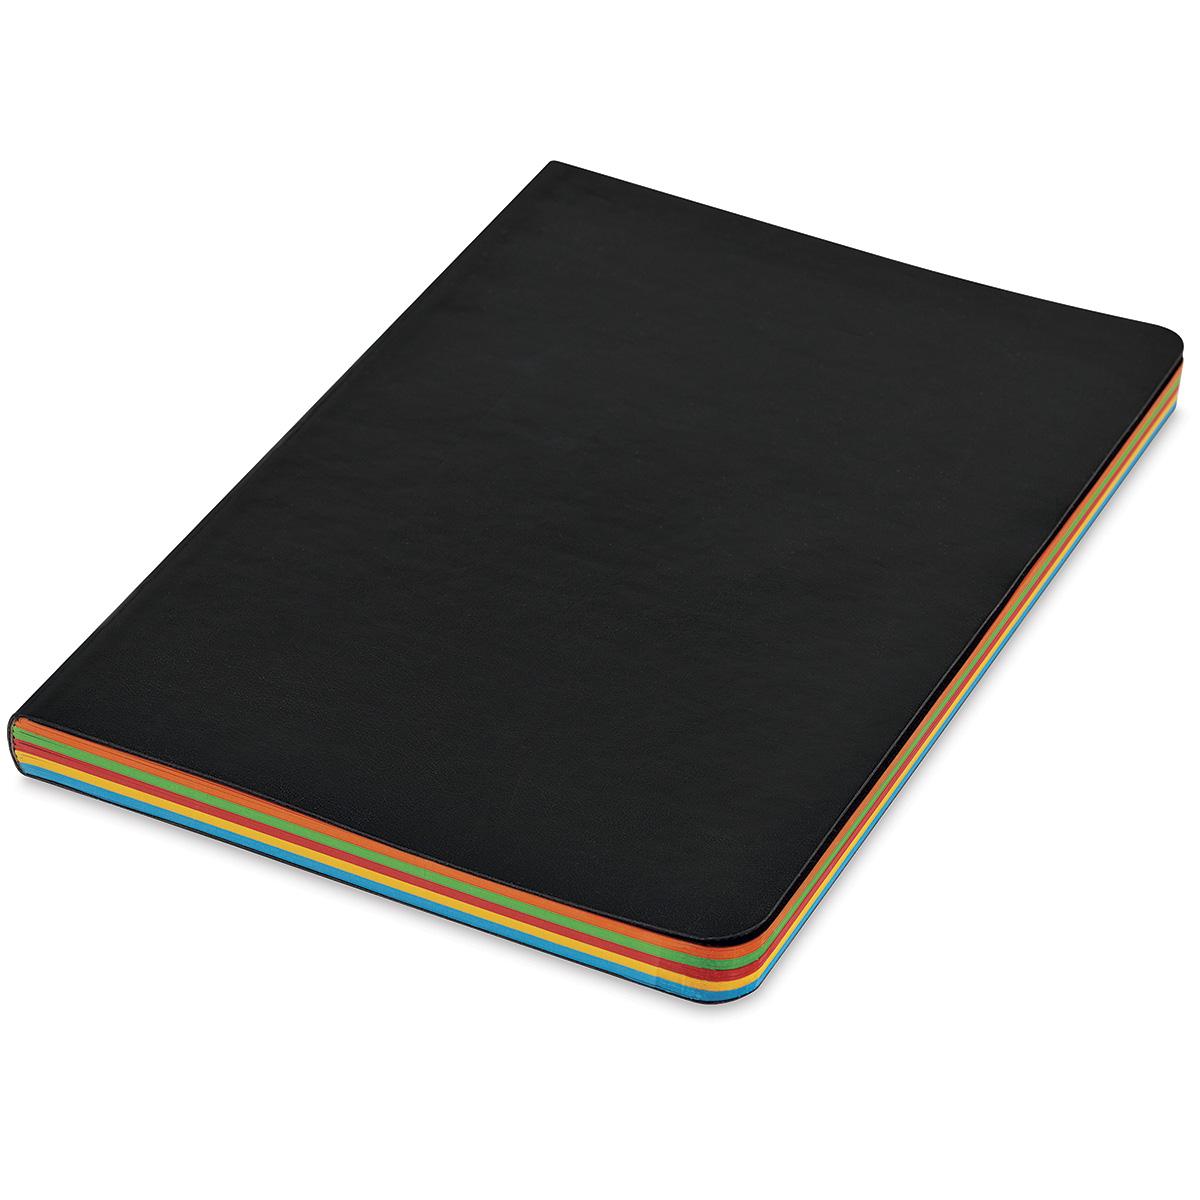 Shizen Faux Leather Journal  - Multi-Color, 8 x 6